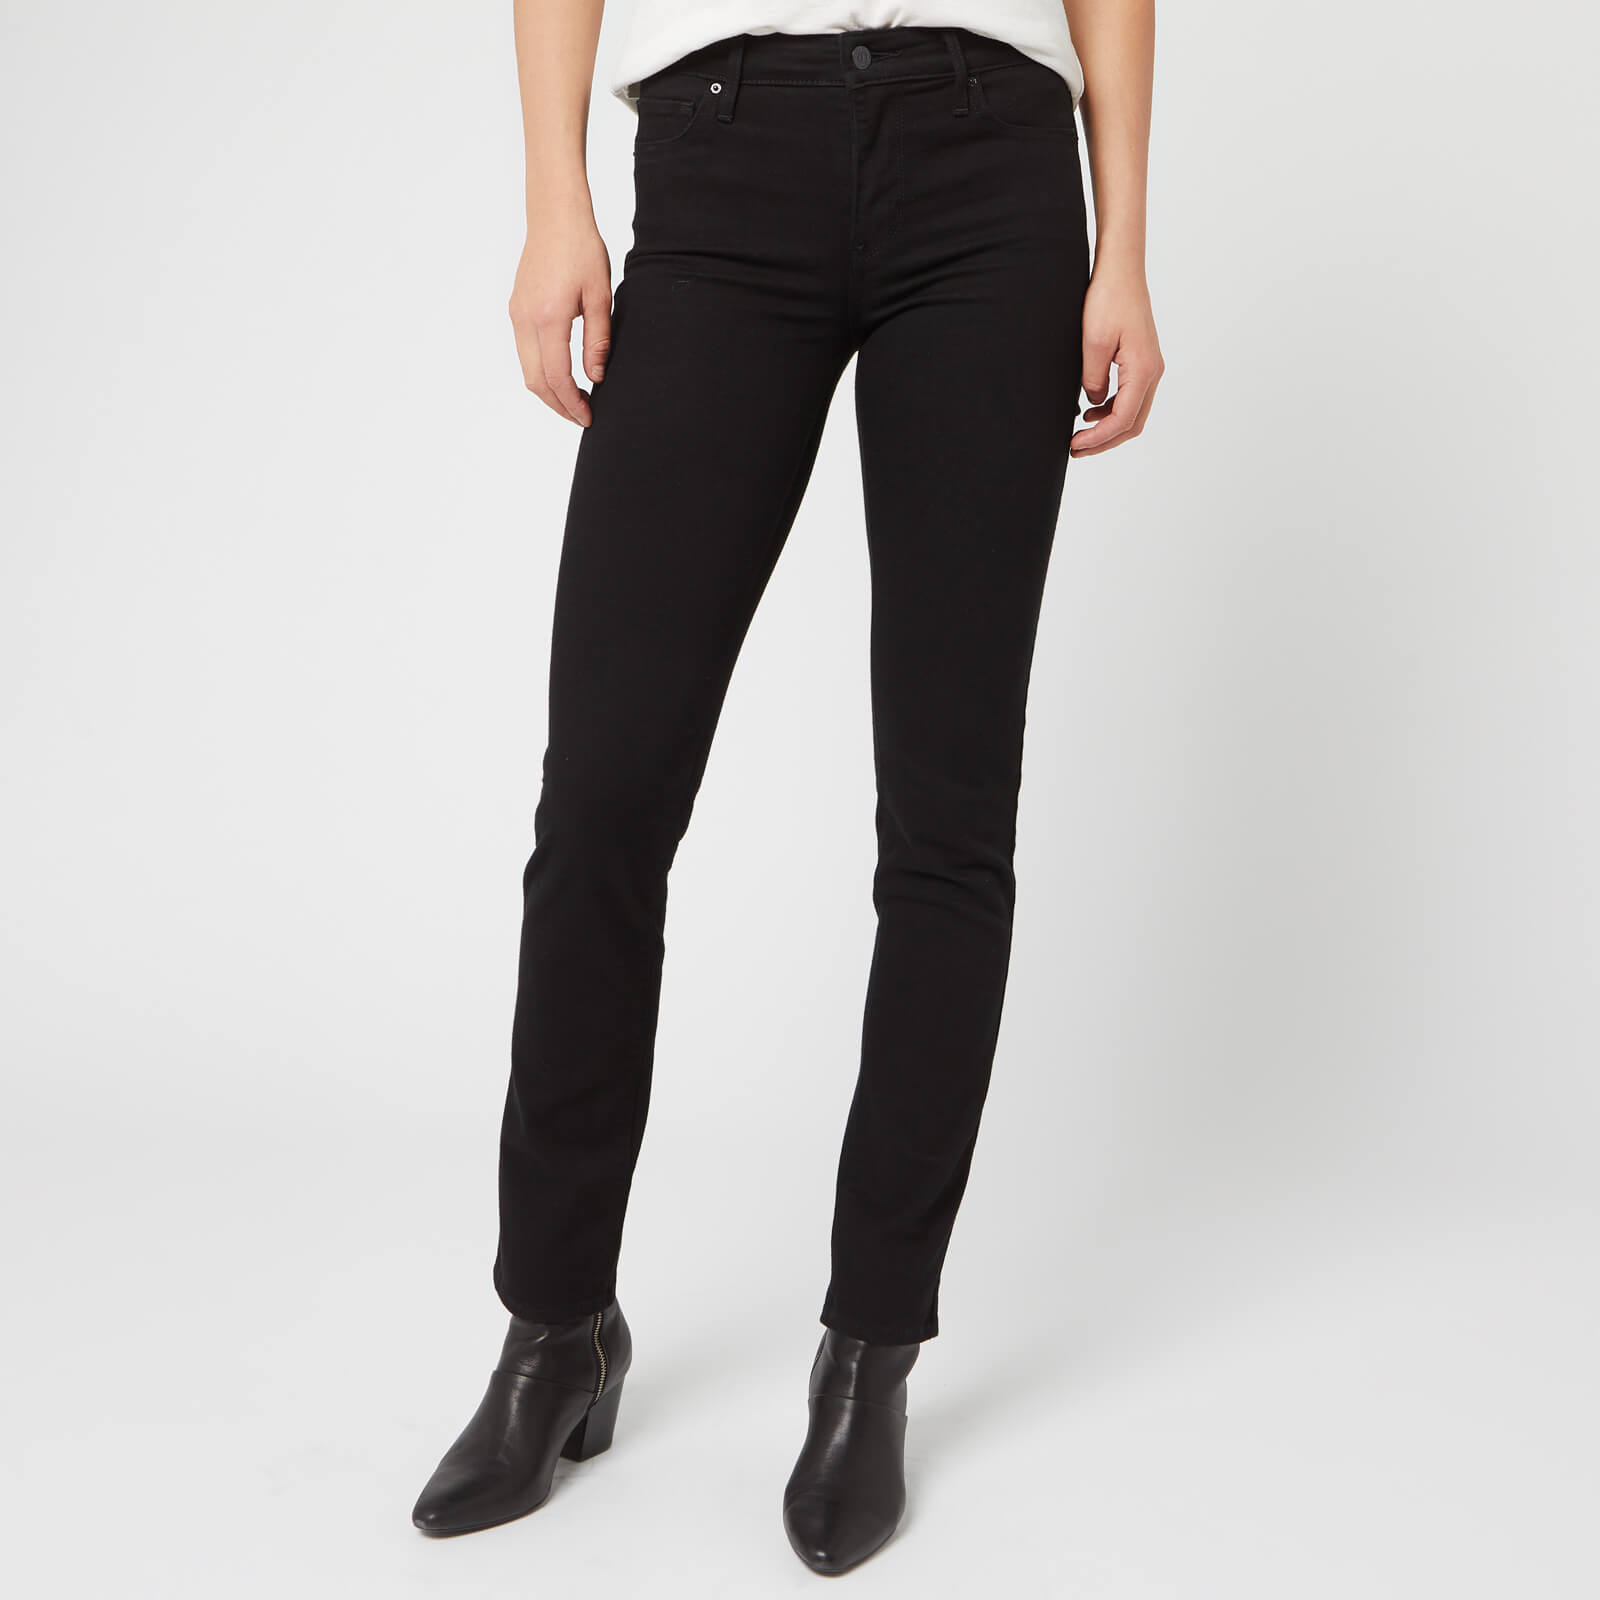 badb8c3b Levi's Women's 712 Slim Jeans - Black Sheep Clothing | TheHut.com